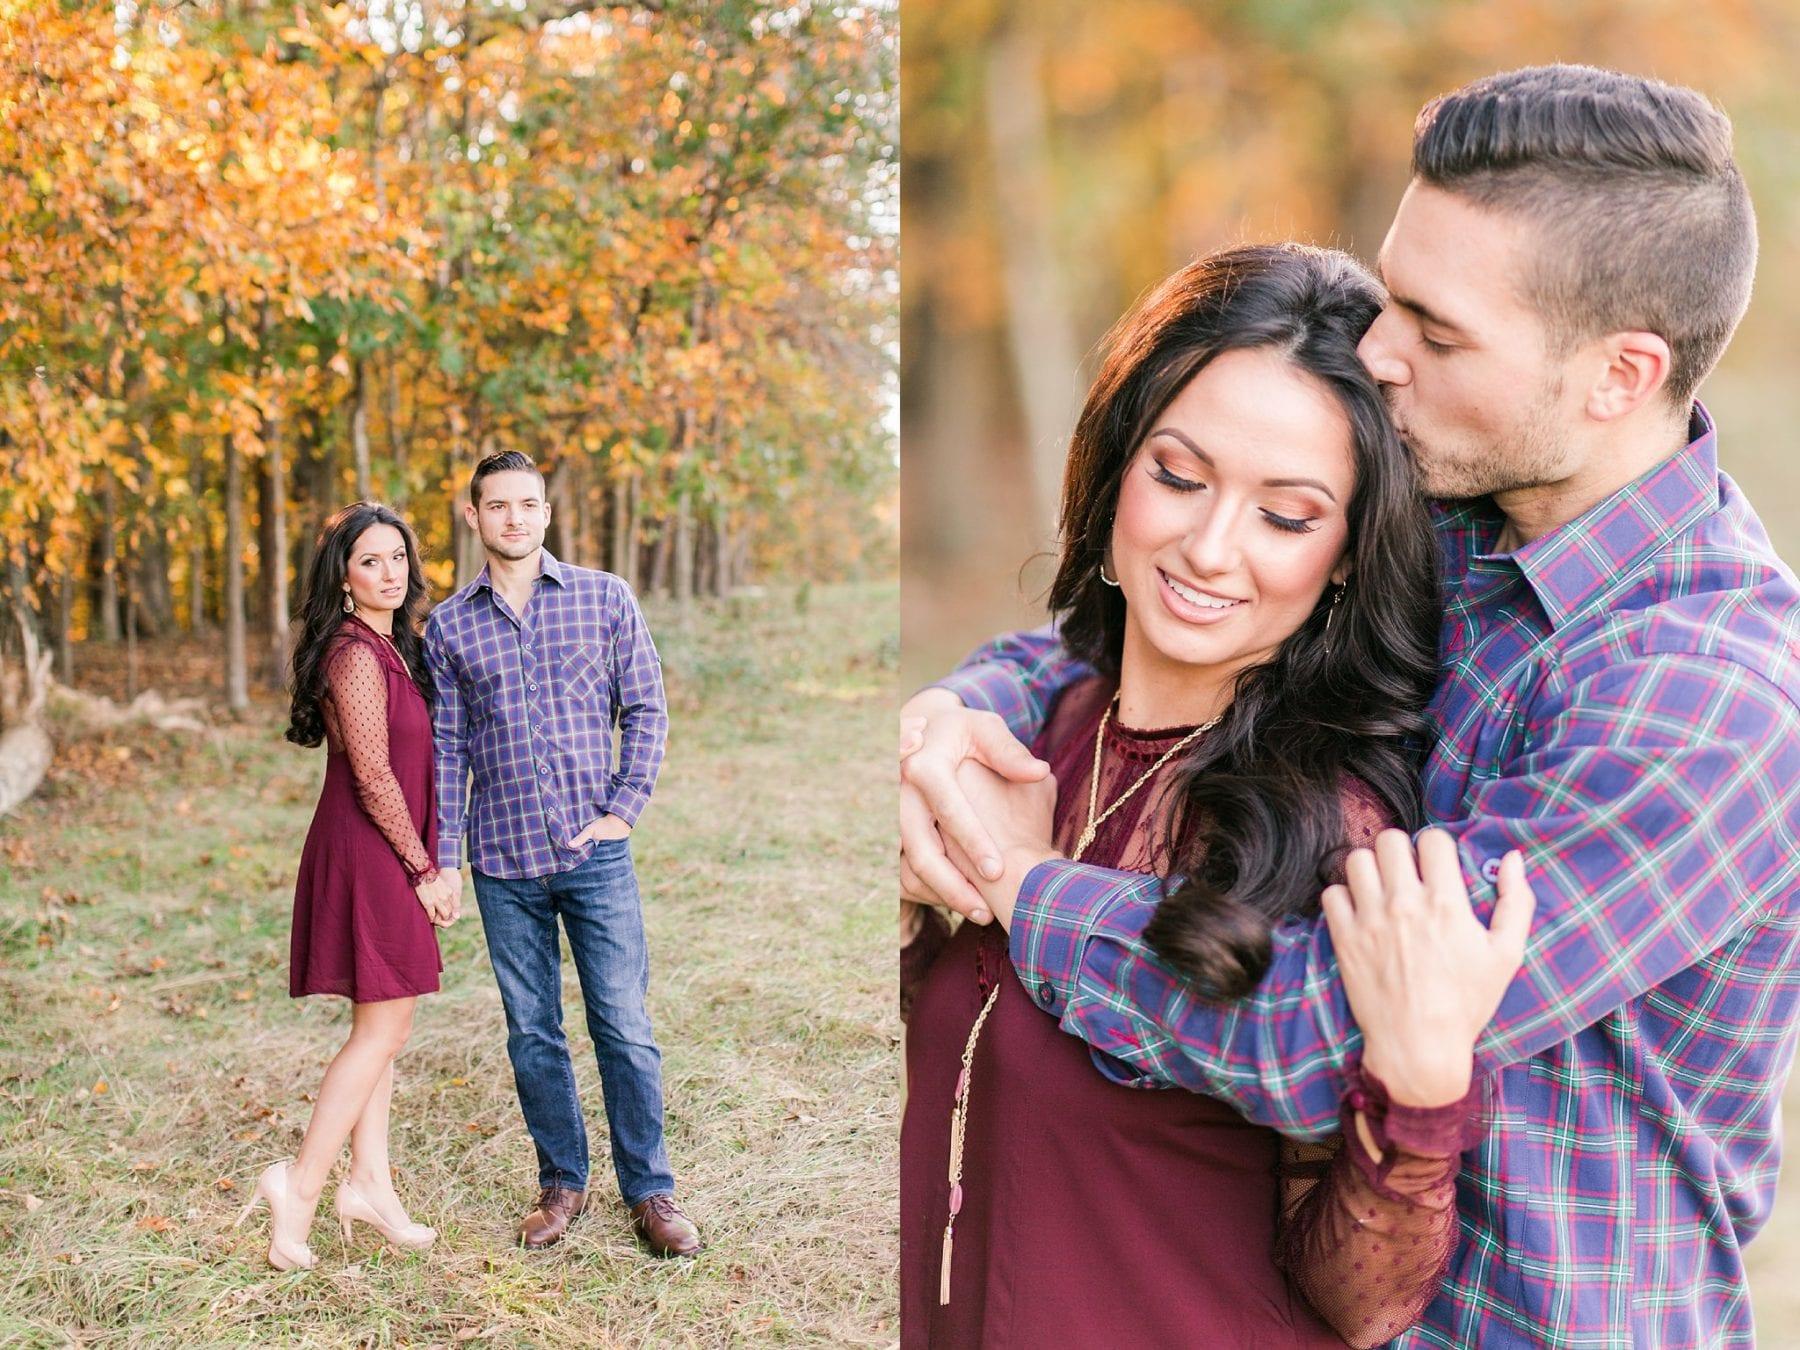 Manassas Battlefield Portraits Virginia Wedding Photographer Megan Kelsey Photography Lianne & Chris-17.jpg